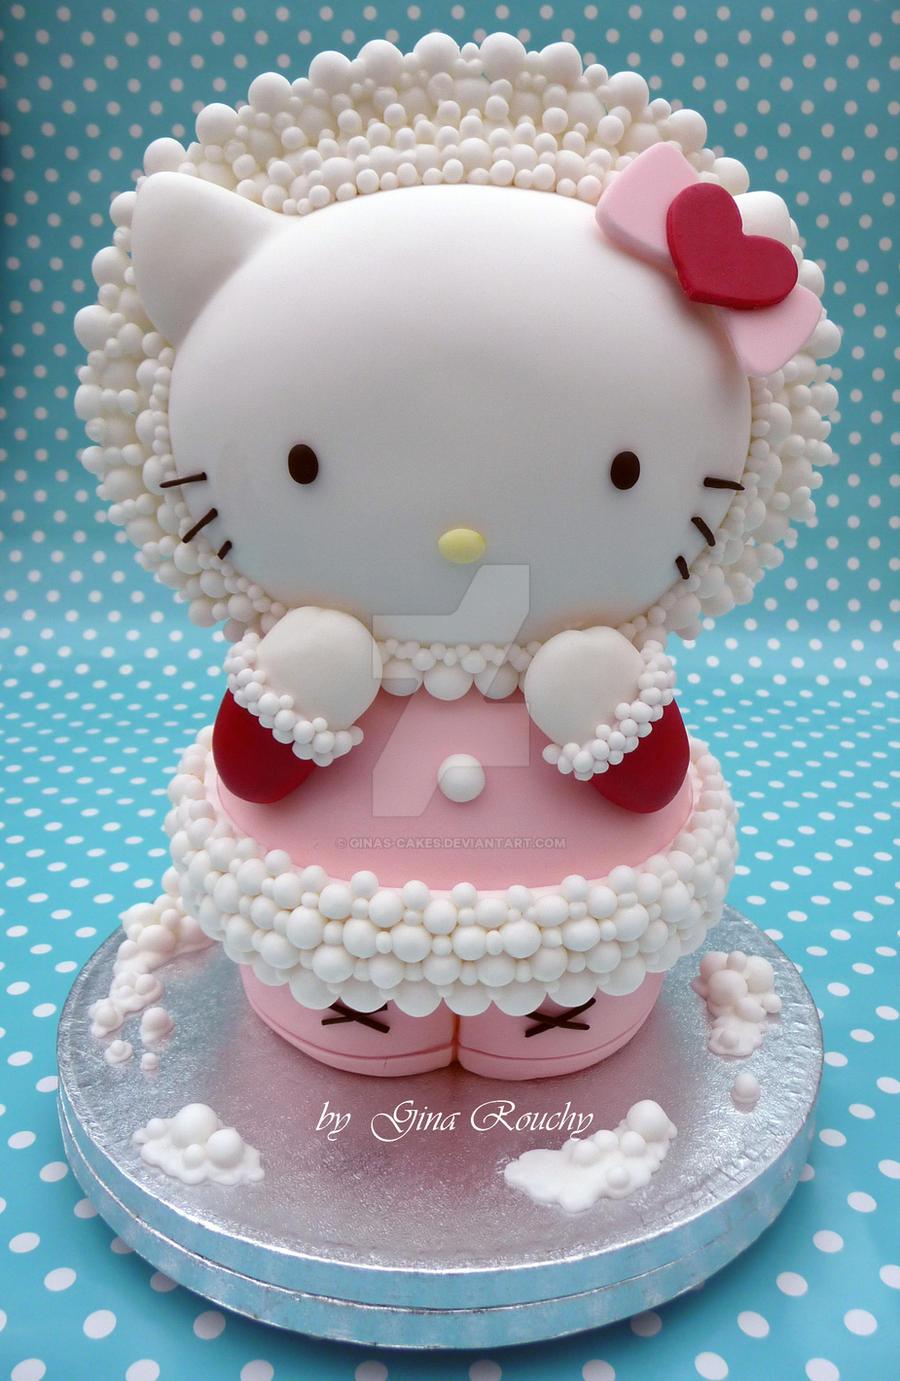 Couvrir Un Cake Design